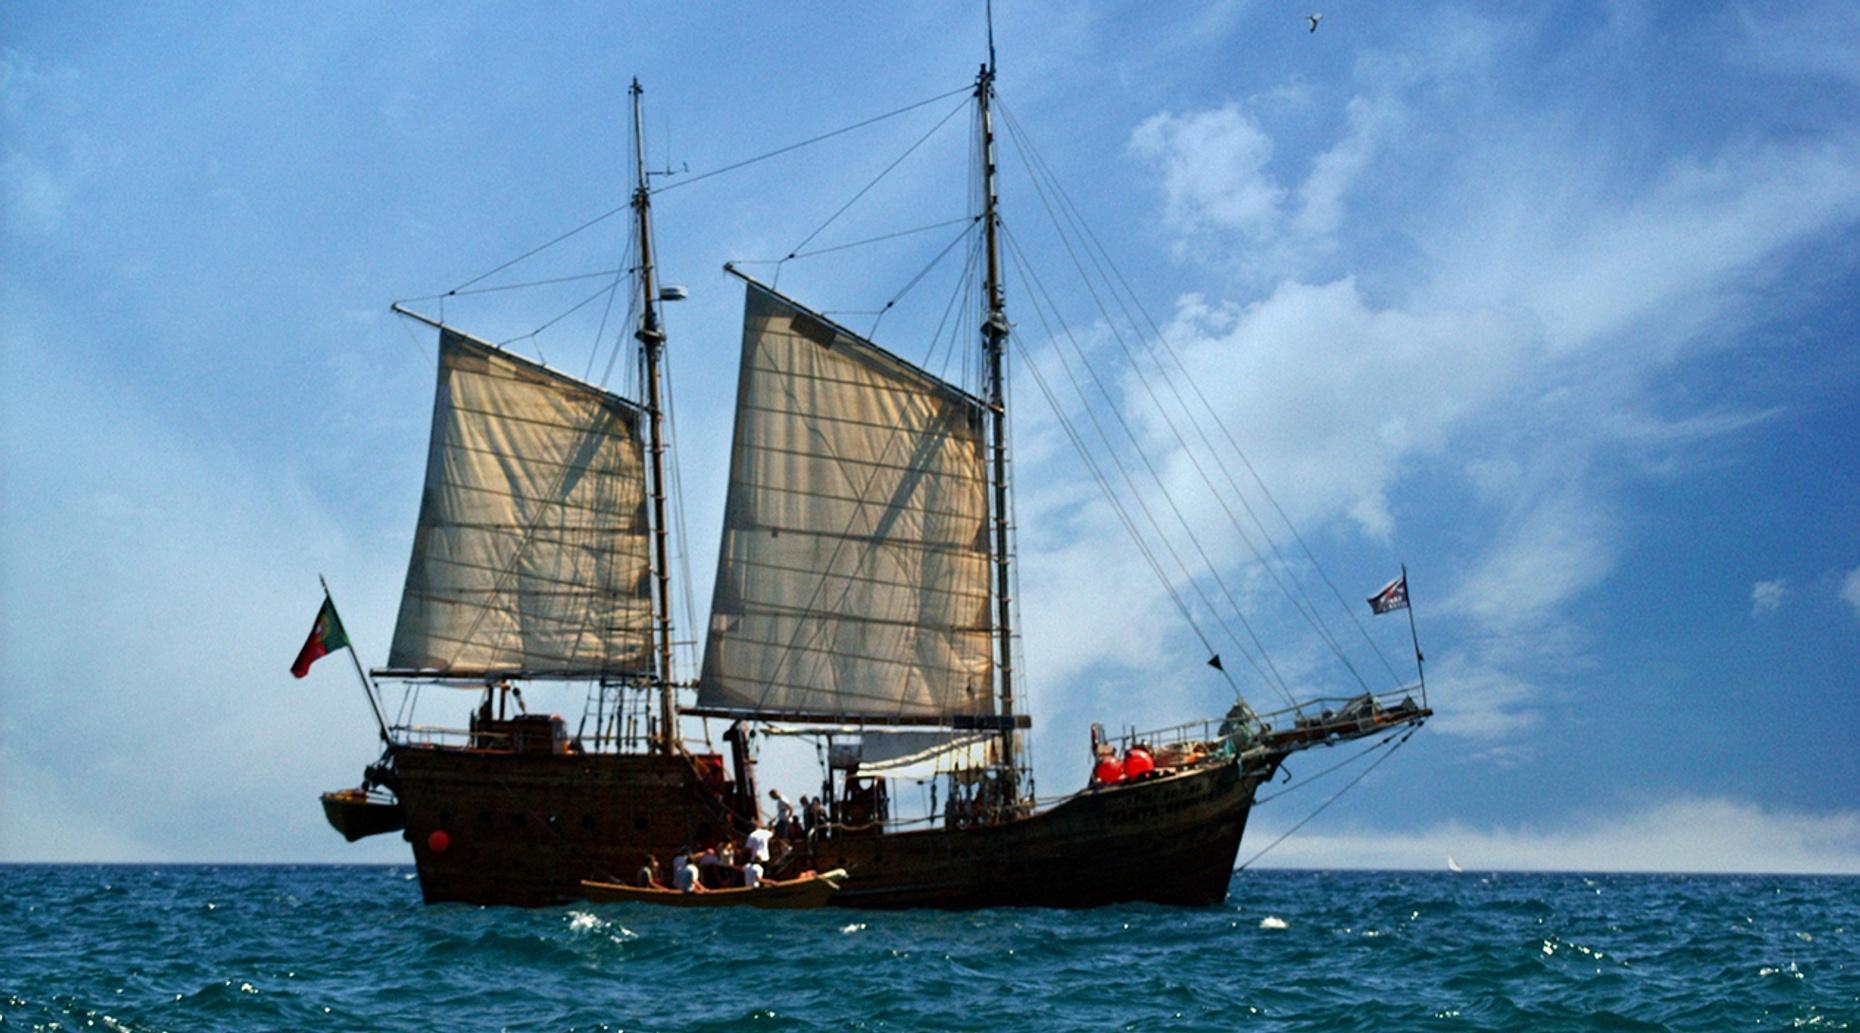 Pirate Treasure Cruise in Beaufort